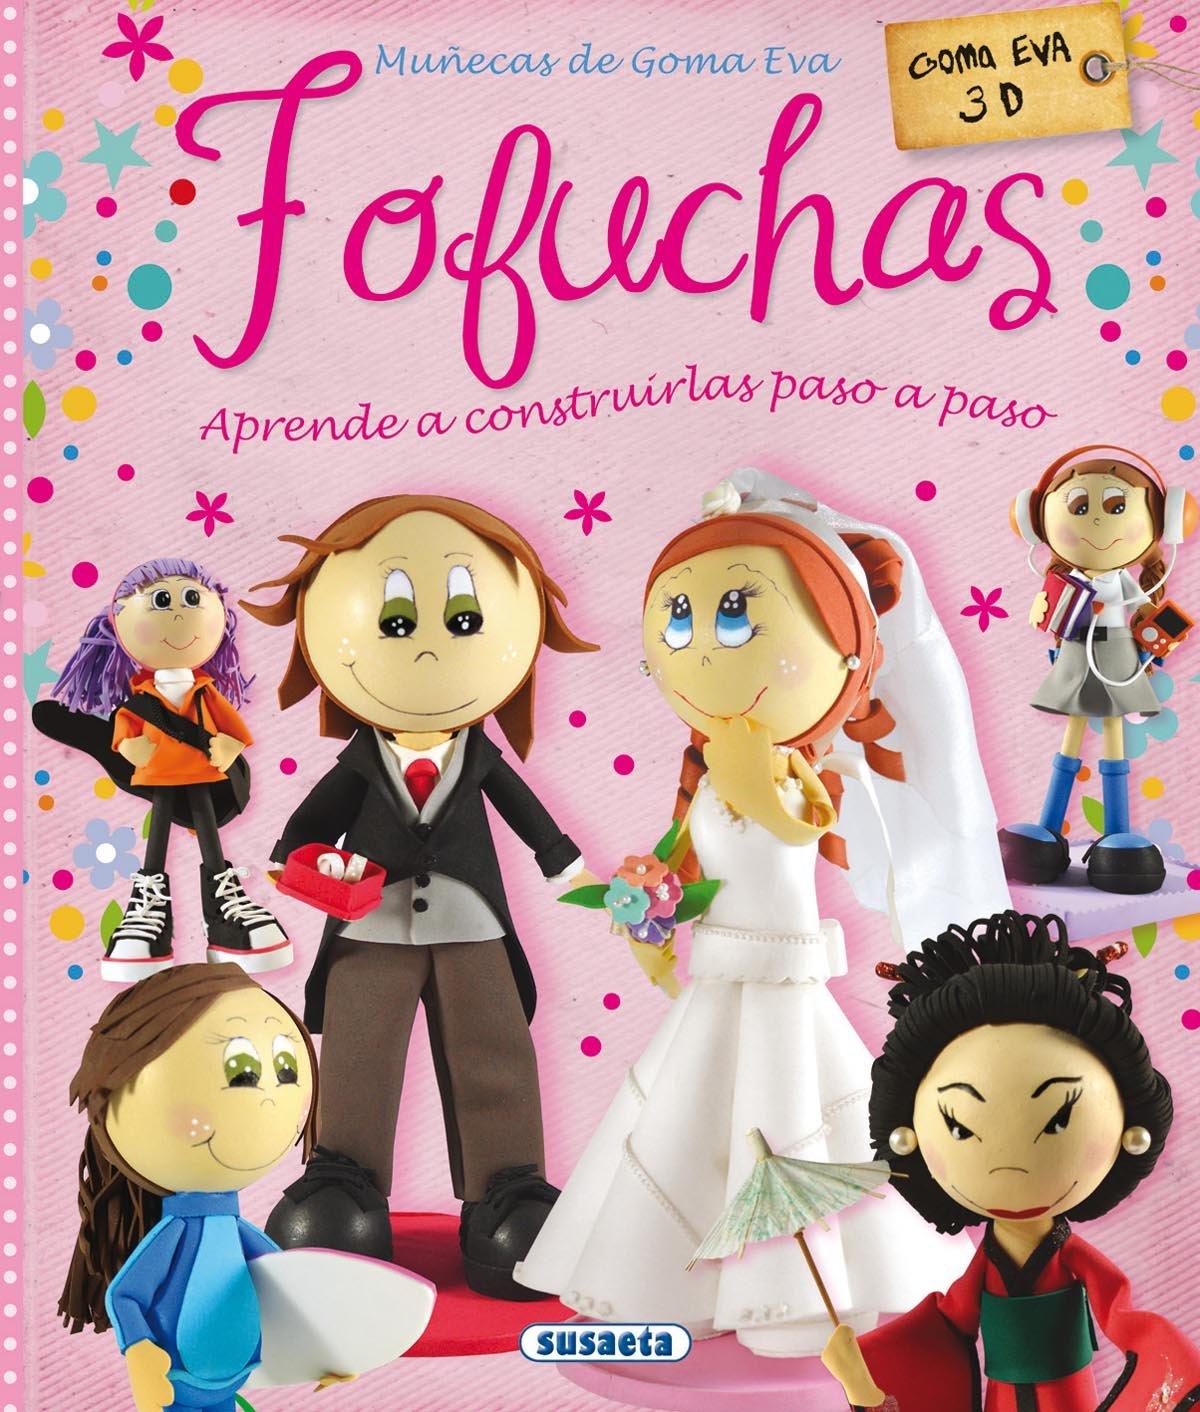 Fofuchas Muñecas De Goma Eva 100 Manualidades Amazones Alicia